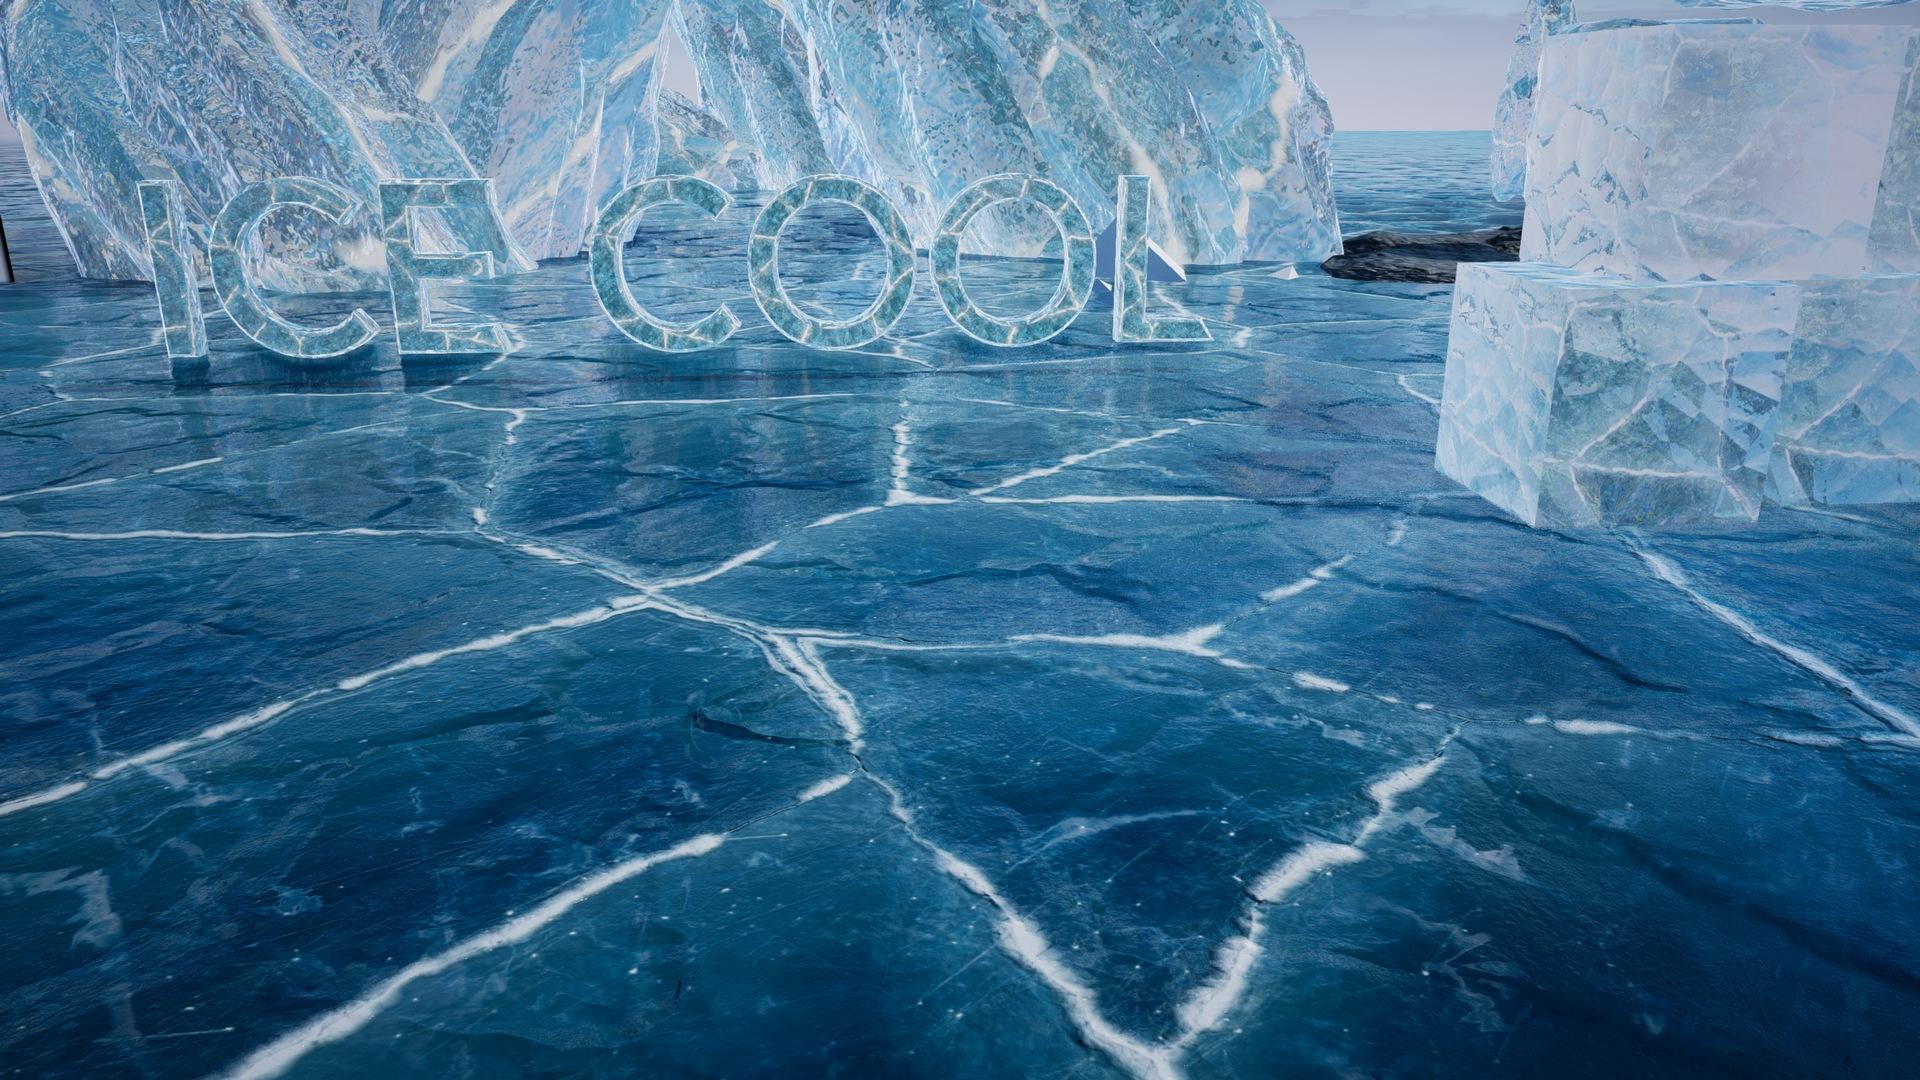 Ice Cool by Krystian Komisarek in Materials - UE4 Marketplace